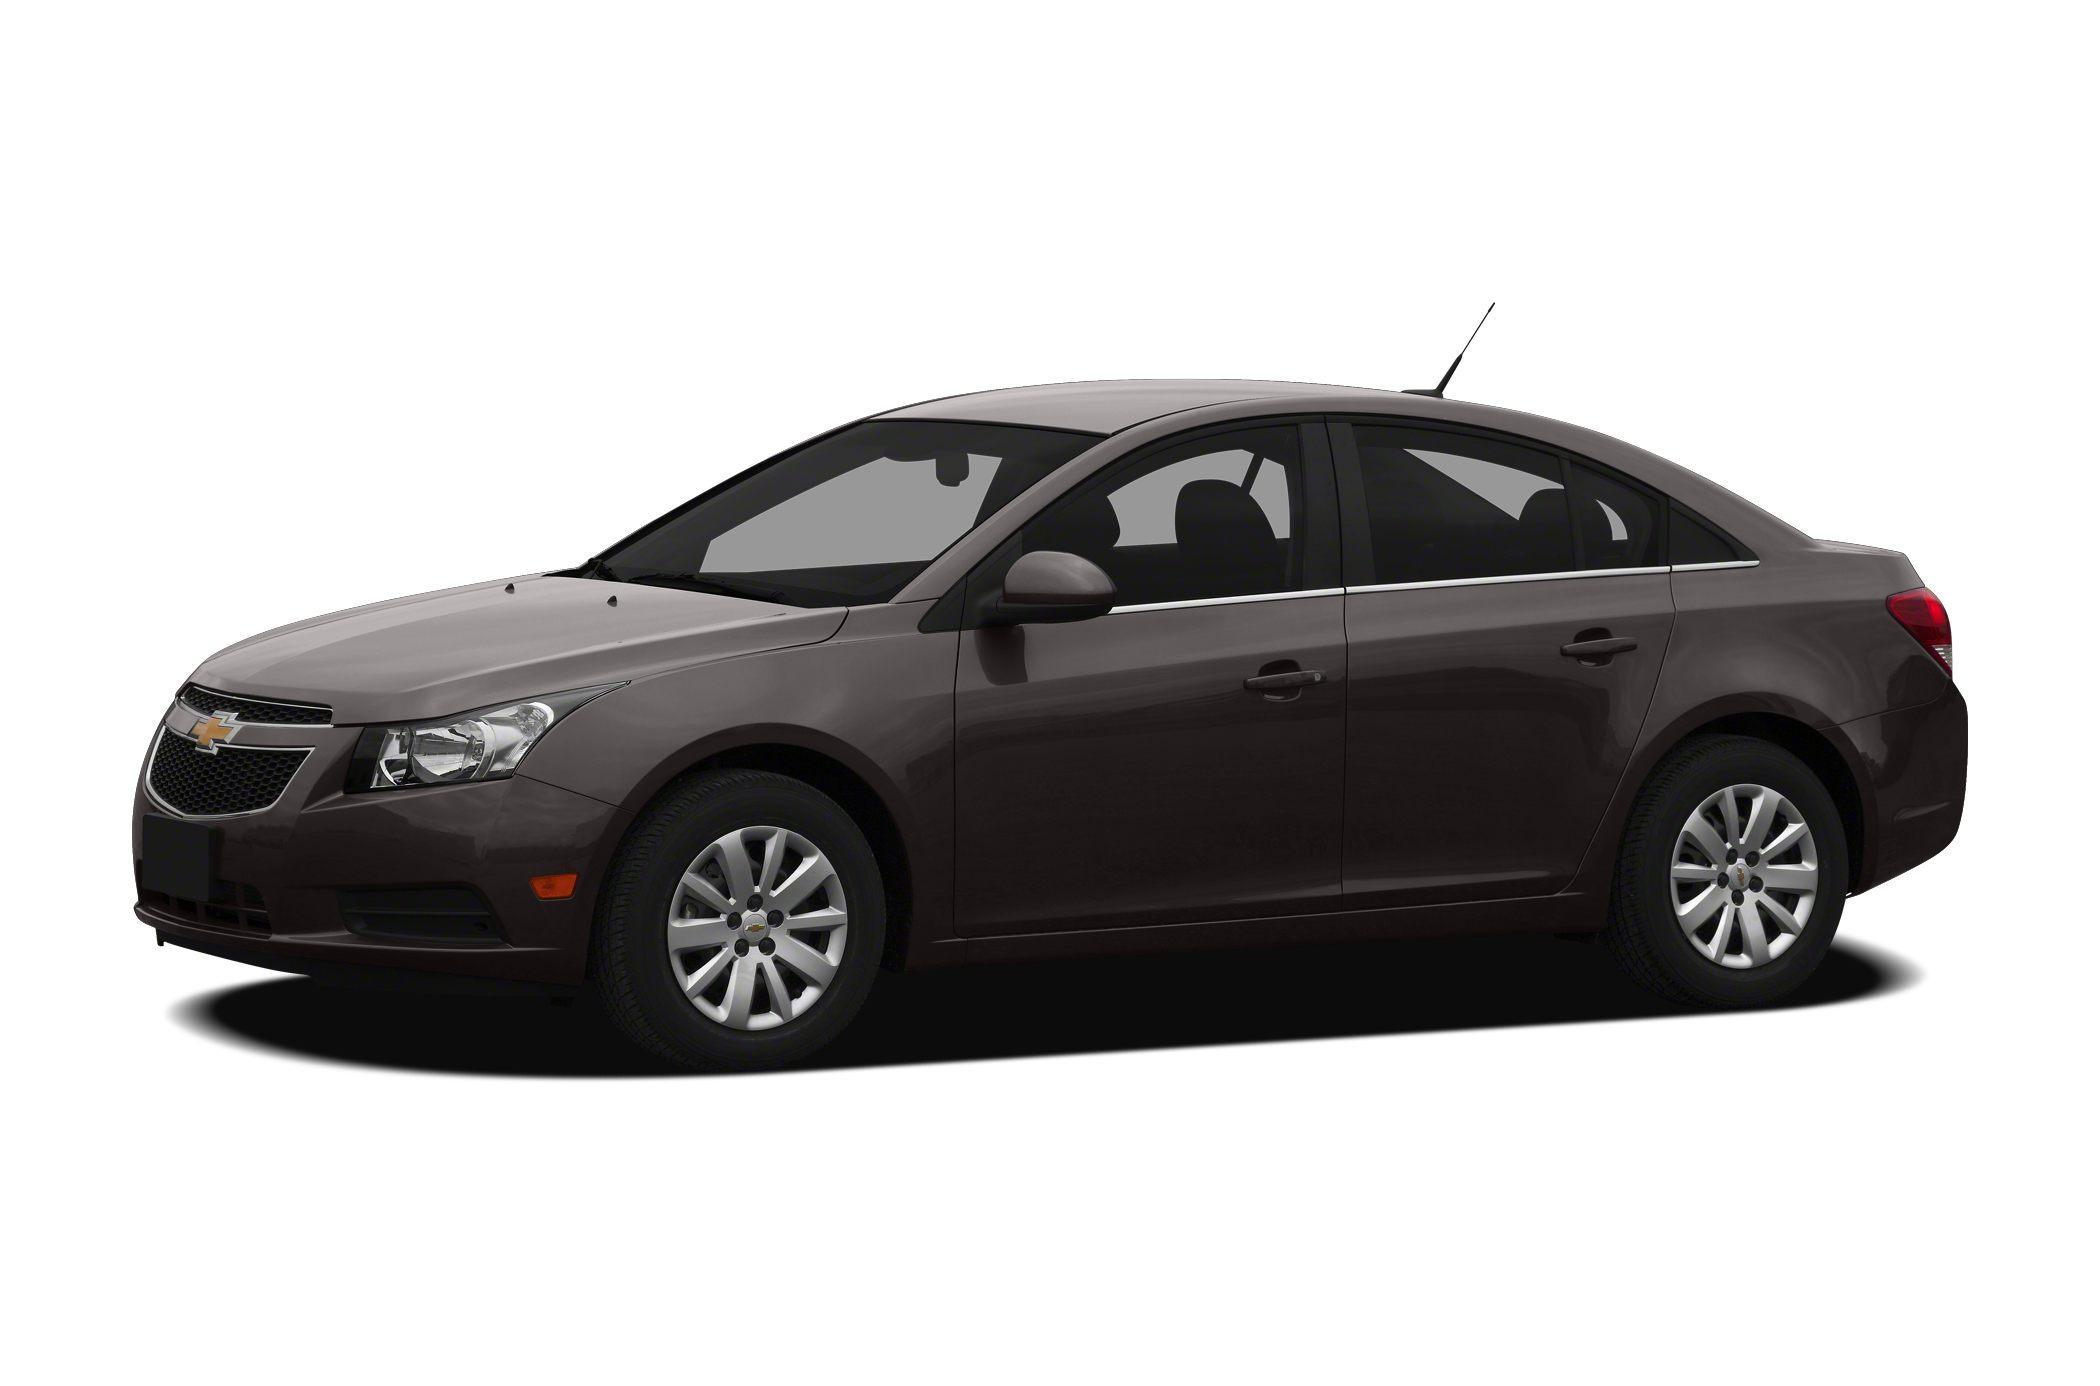 2012 Chevrolet Cruze LS 4dr Sedan Specs and Prices